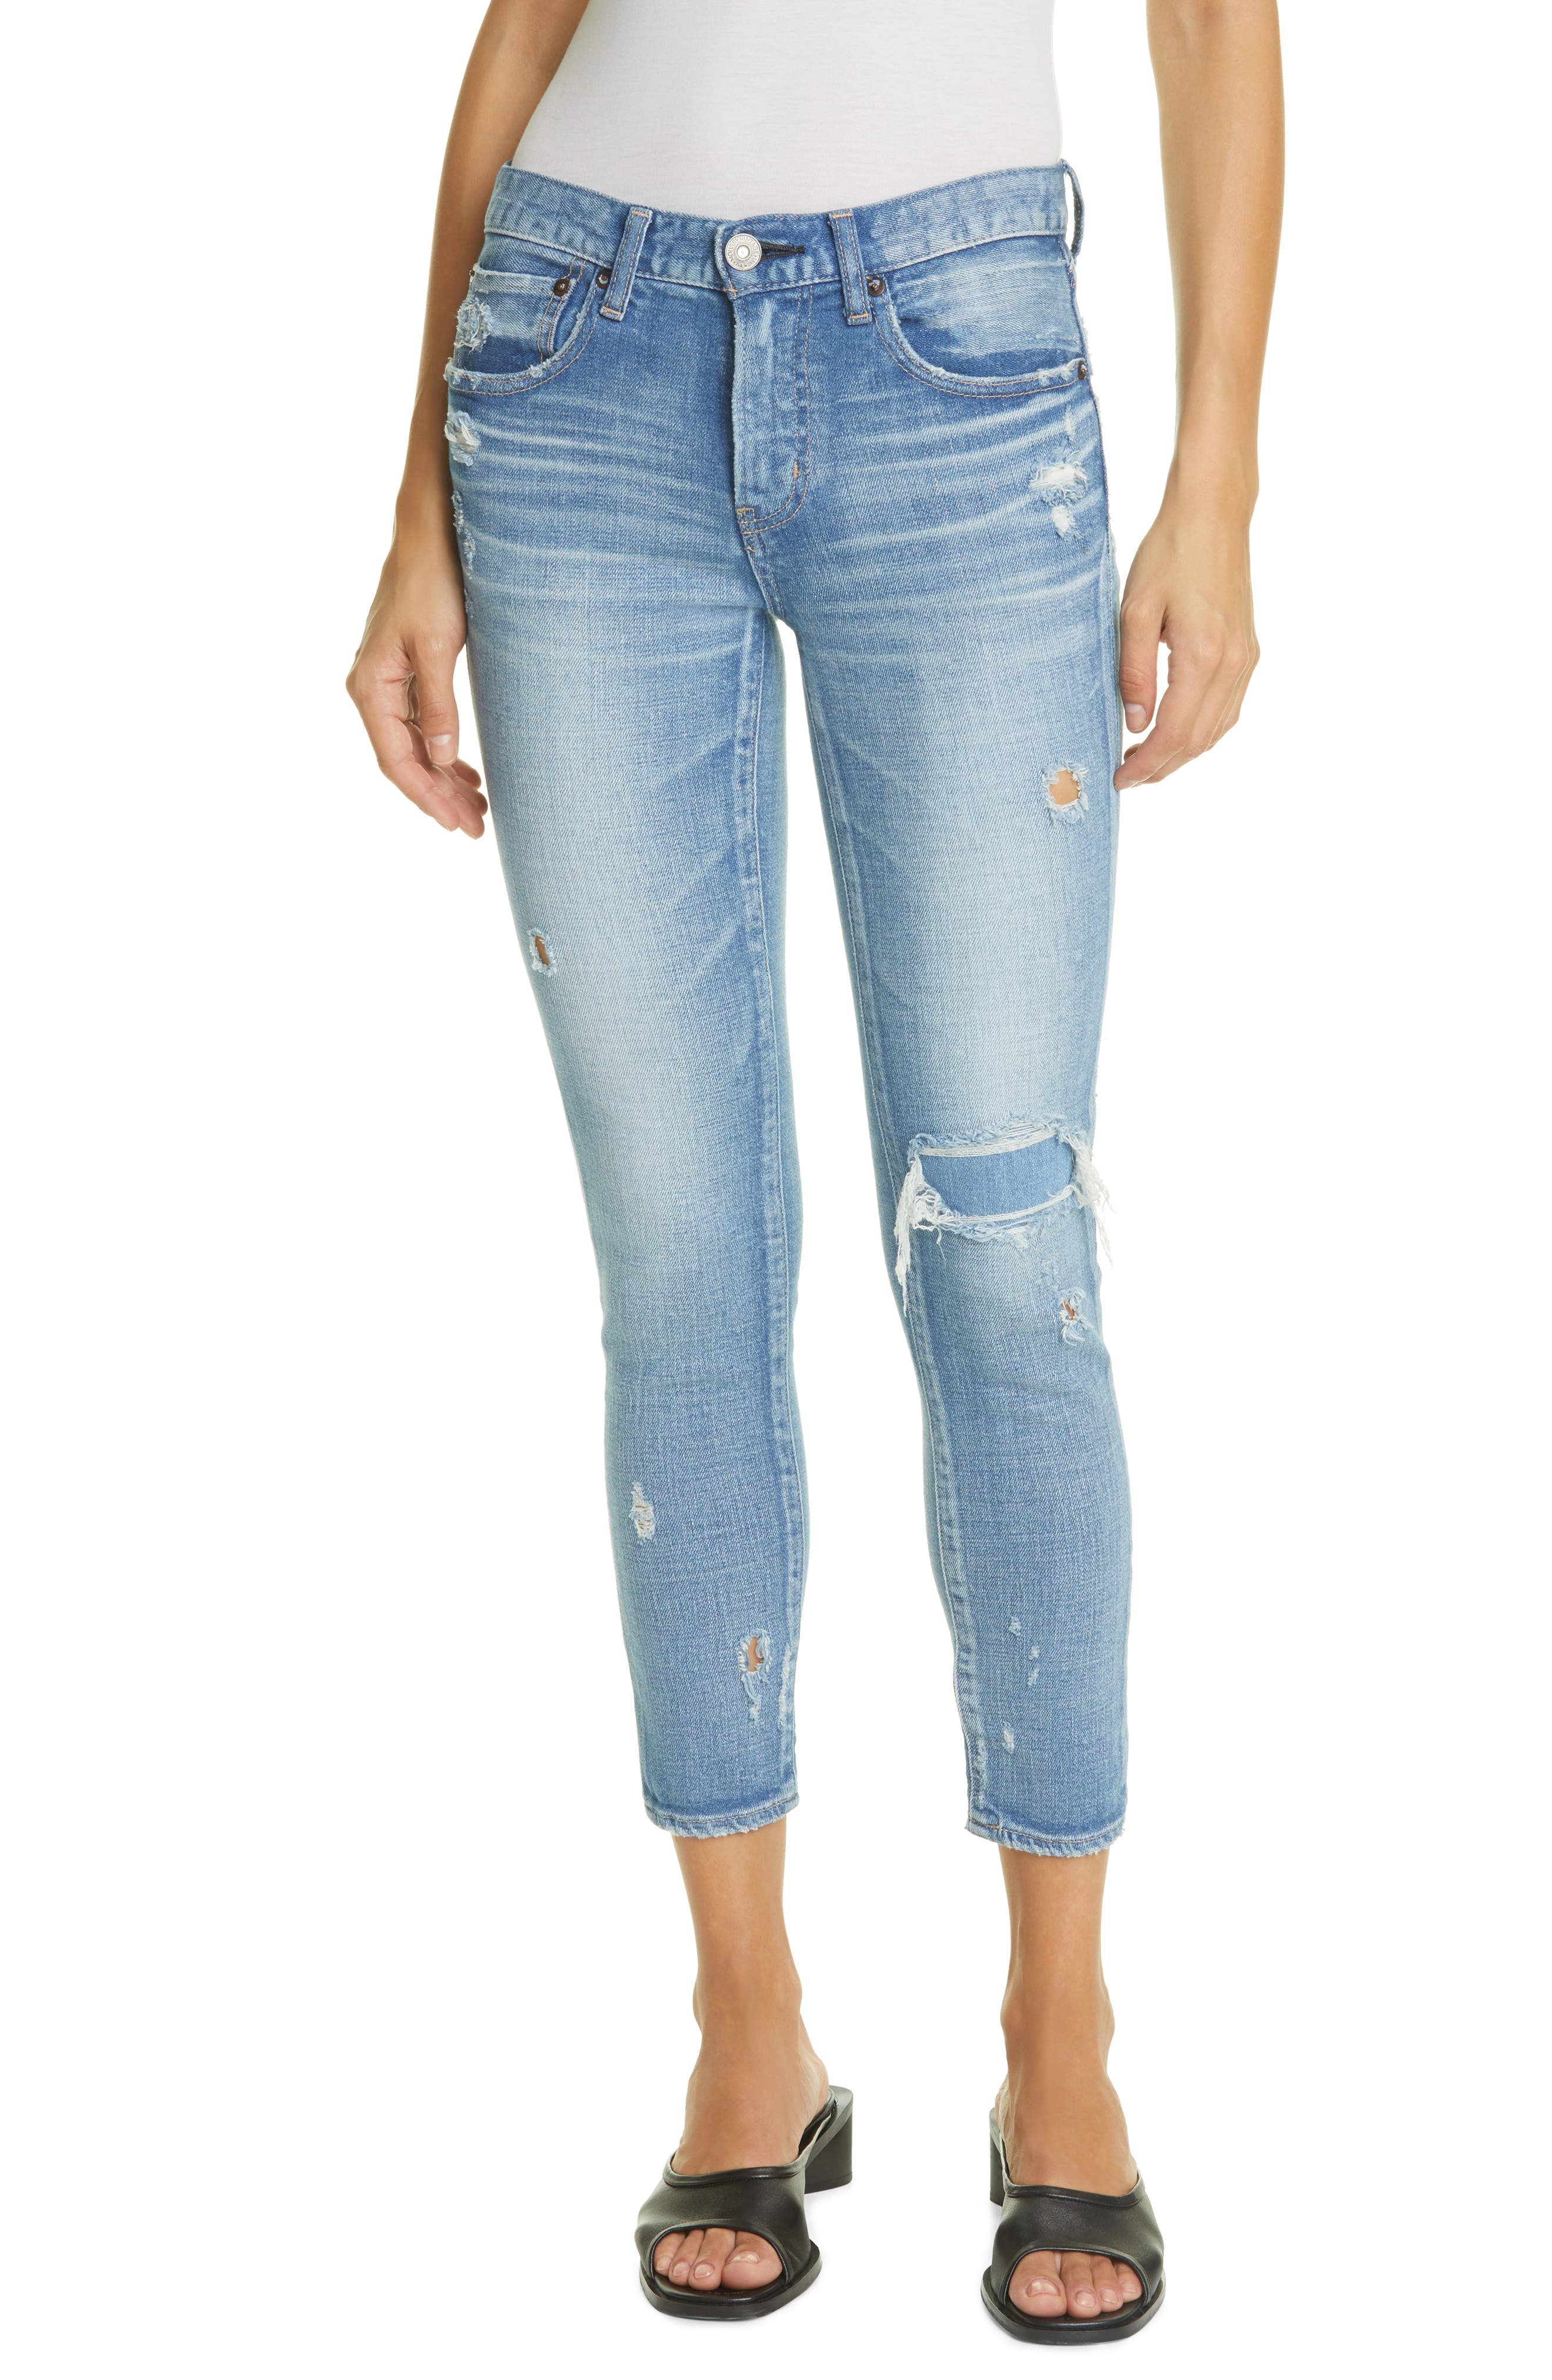 Lenwood Distressed Skinny Jeans